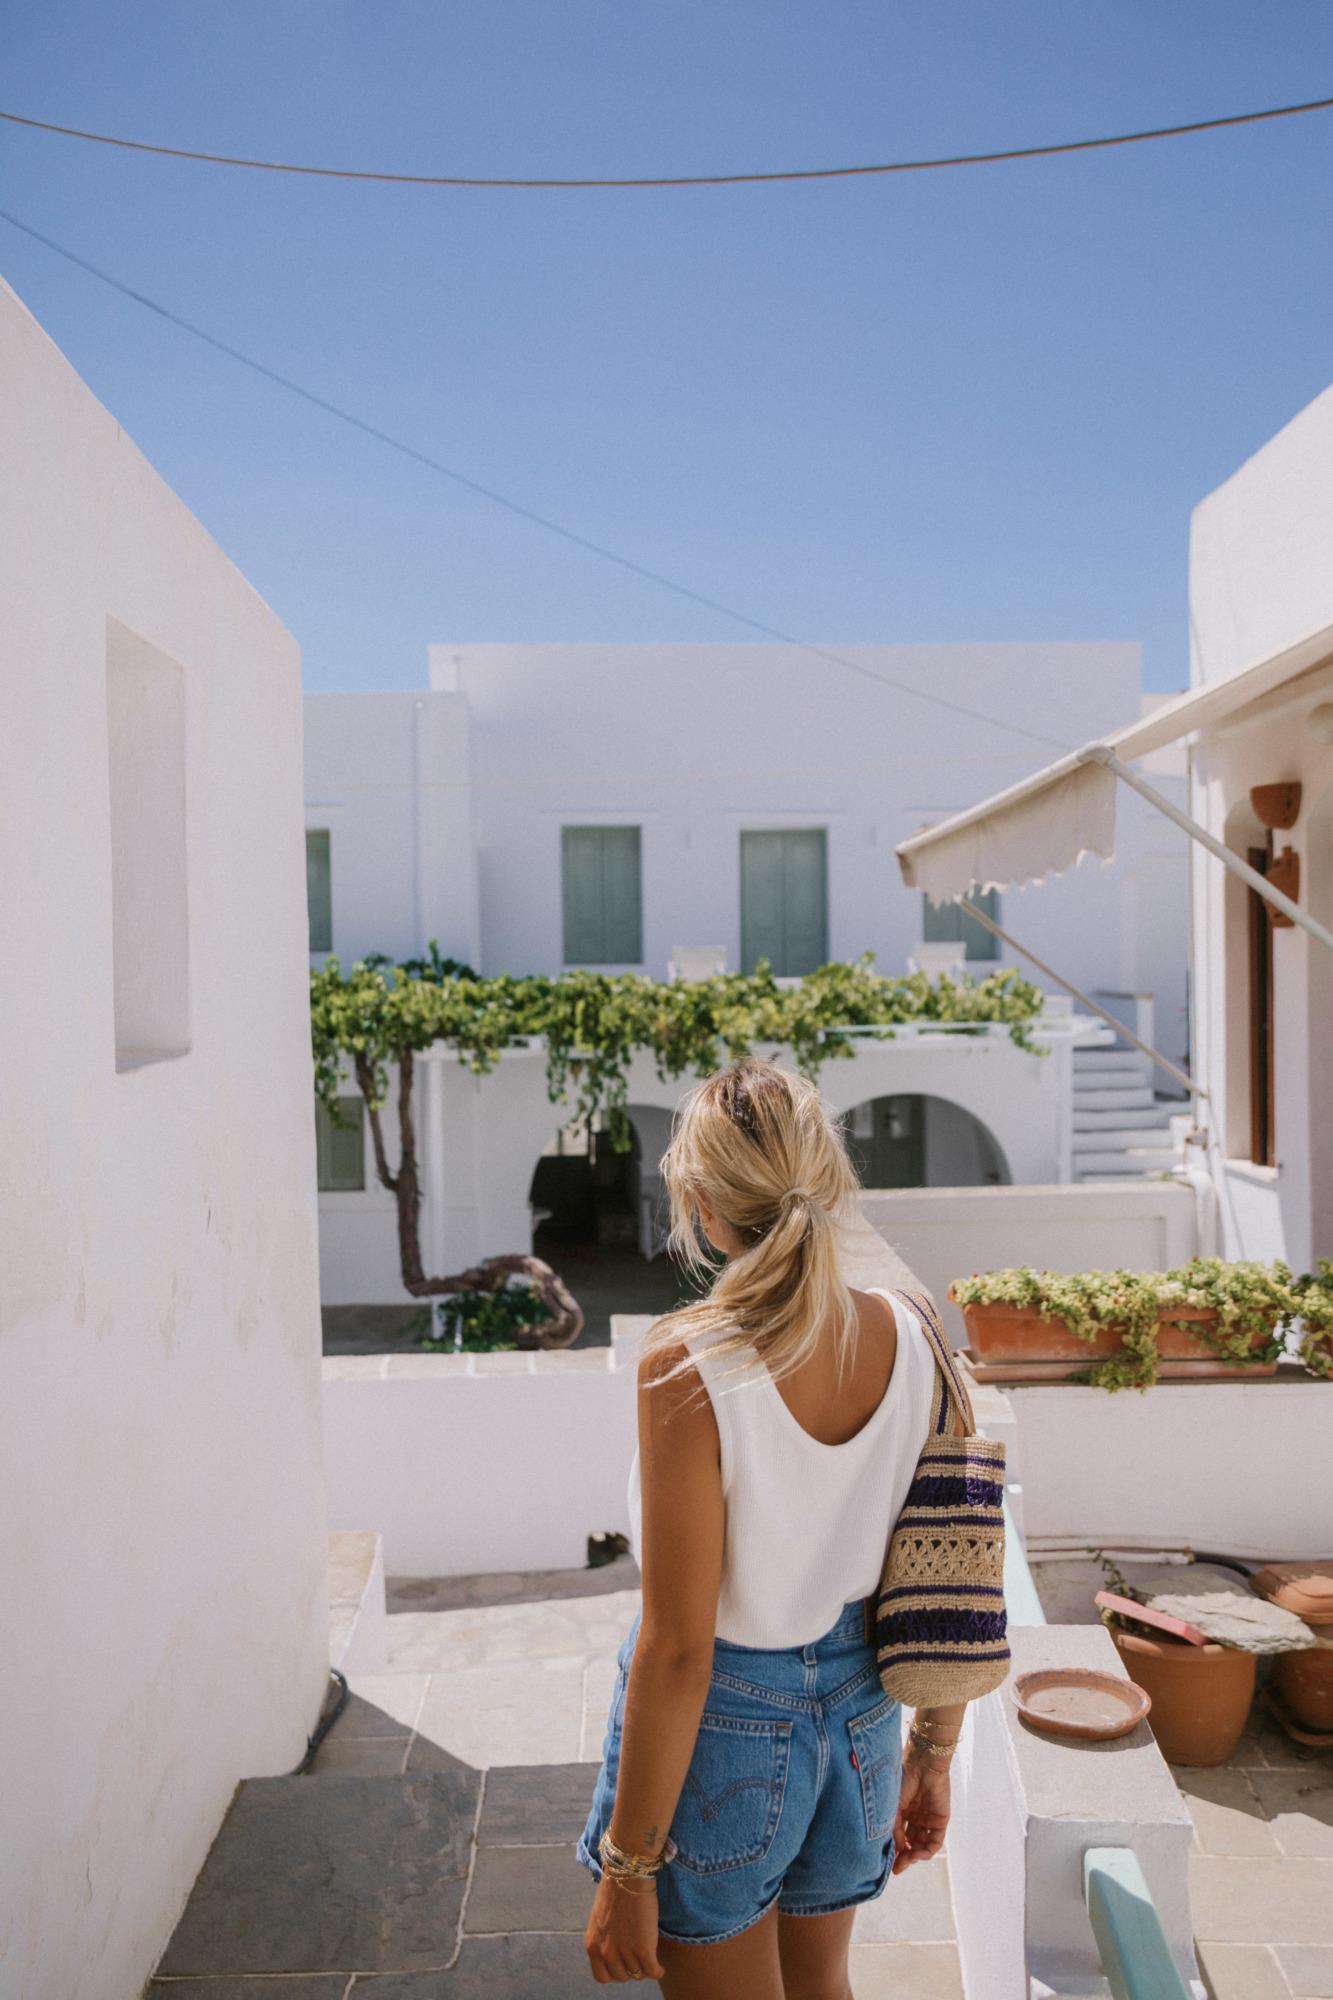 Visiter Artemonas Sifnos - Blondie Baby blog voyages